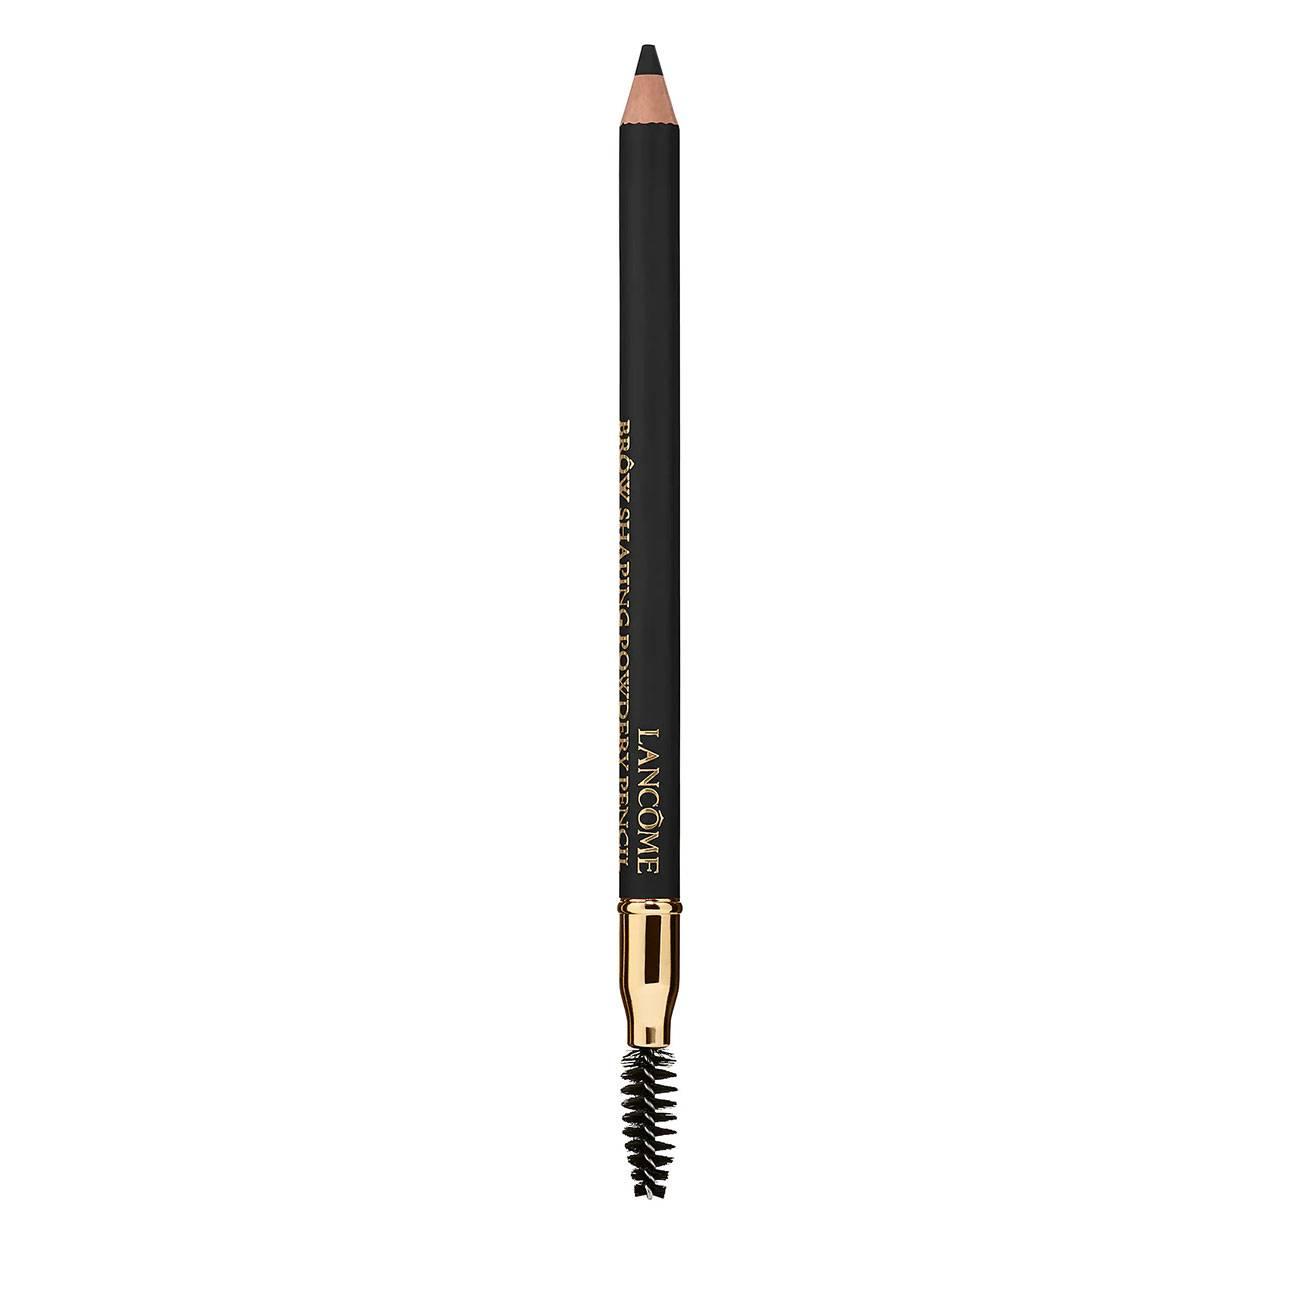 Brow Shaping Powdery Pencil 10 1.3gr Lancôme imagine 2021 bestvalue.eu